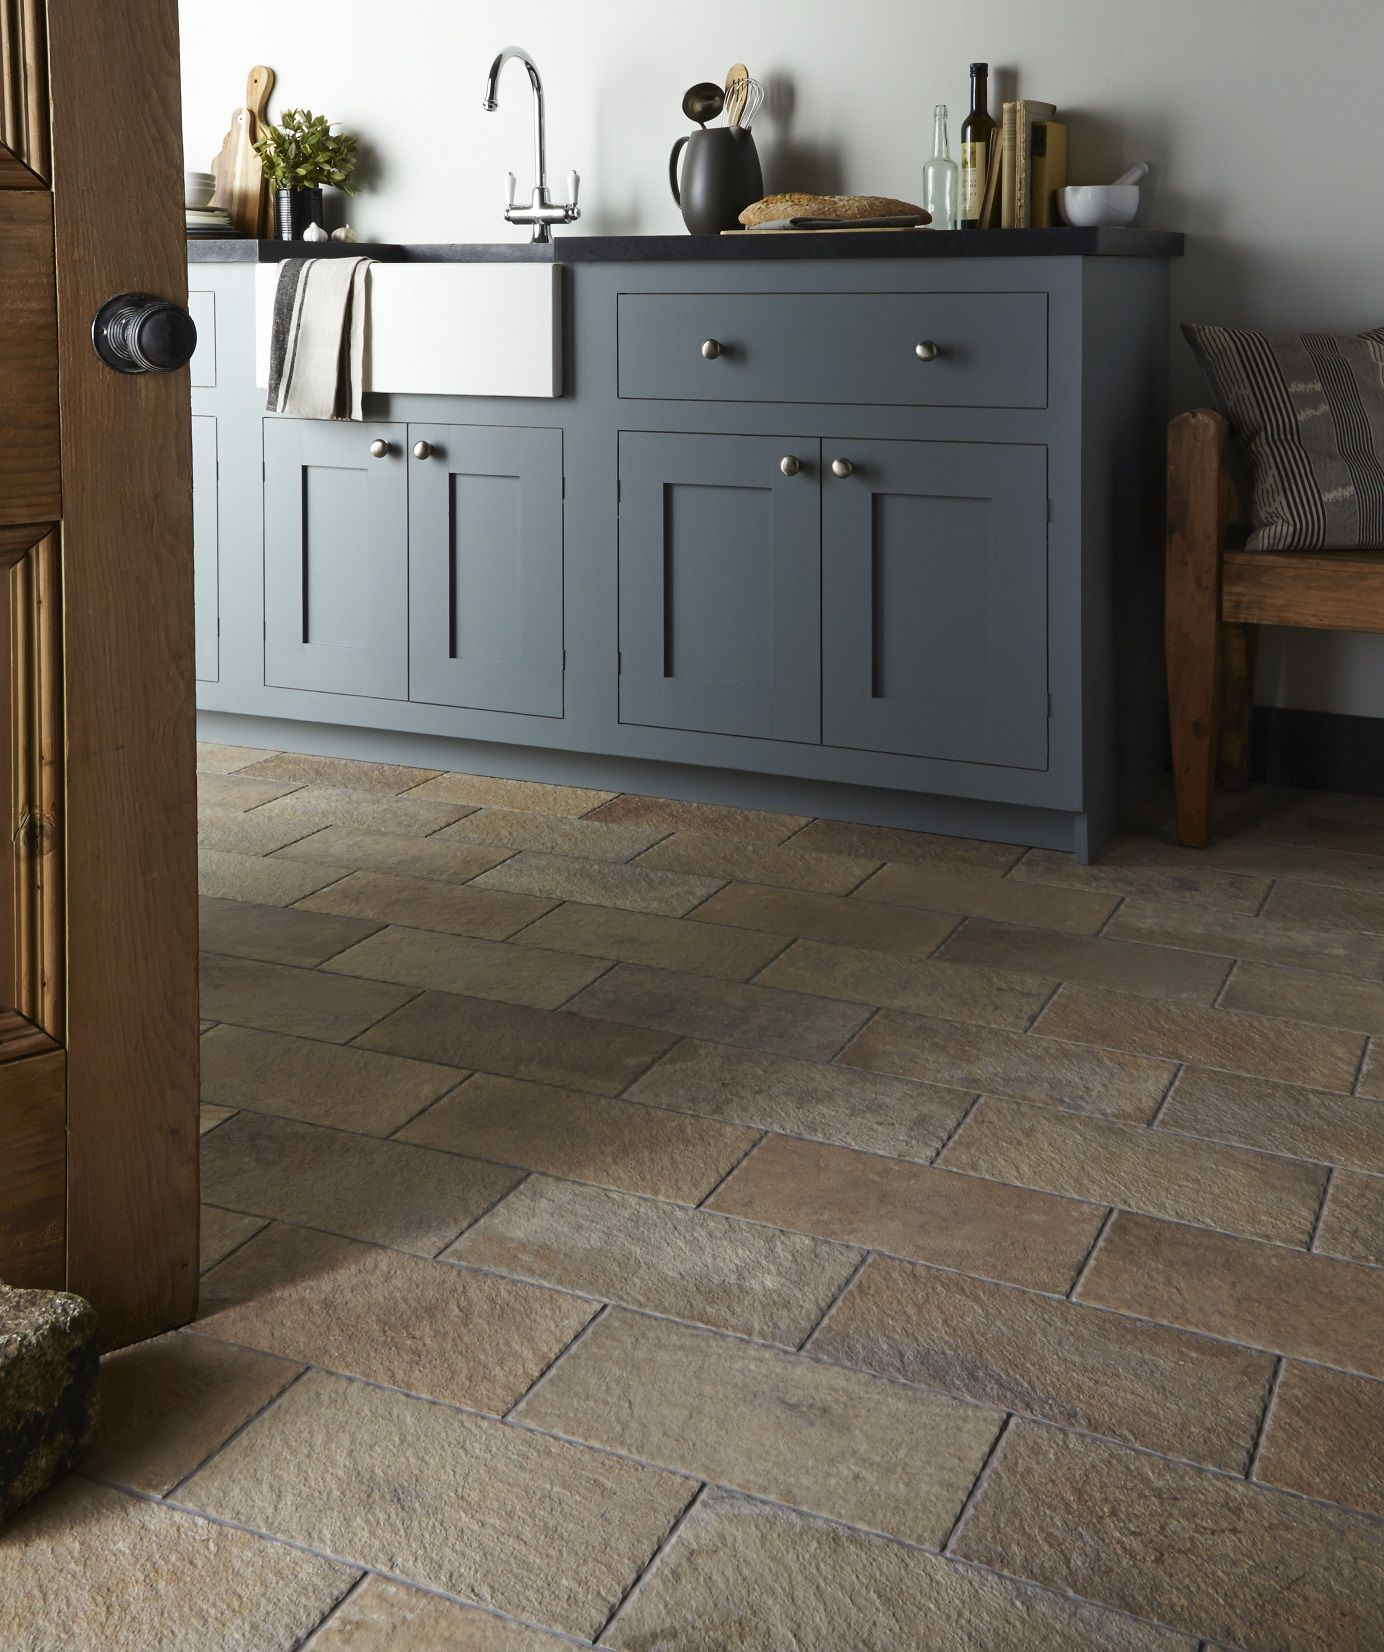 Callan brick httptoppstilestprod46453callan brick callan brick topps tiles lovely for kitchen dailygadgetfo Gallery